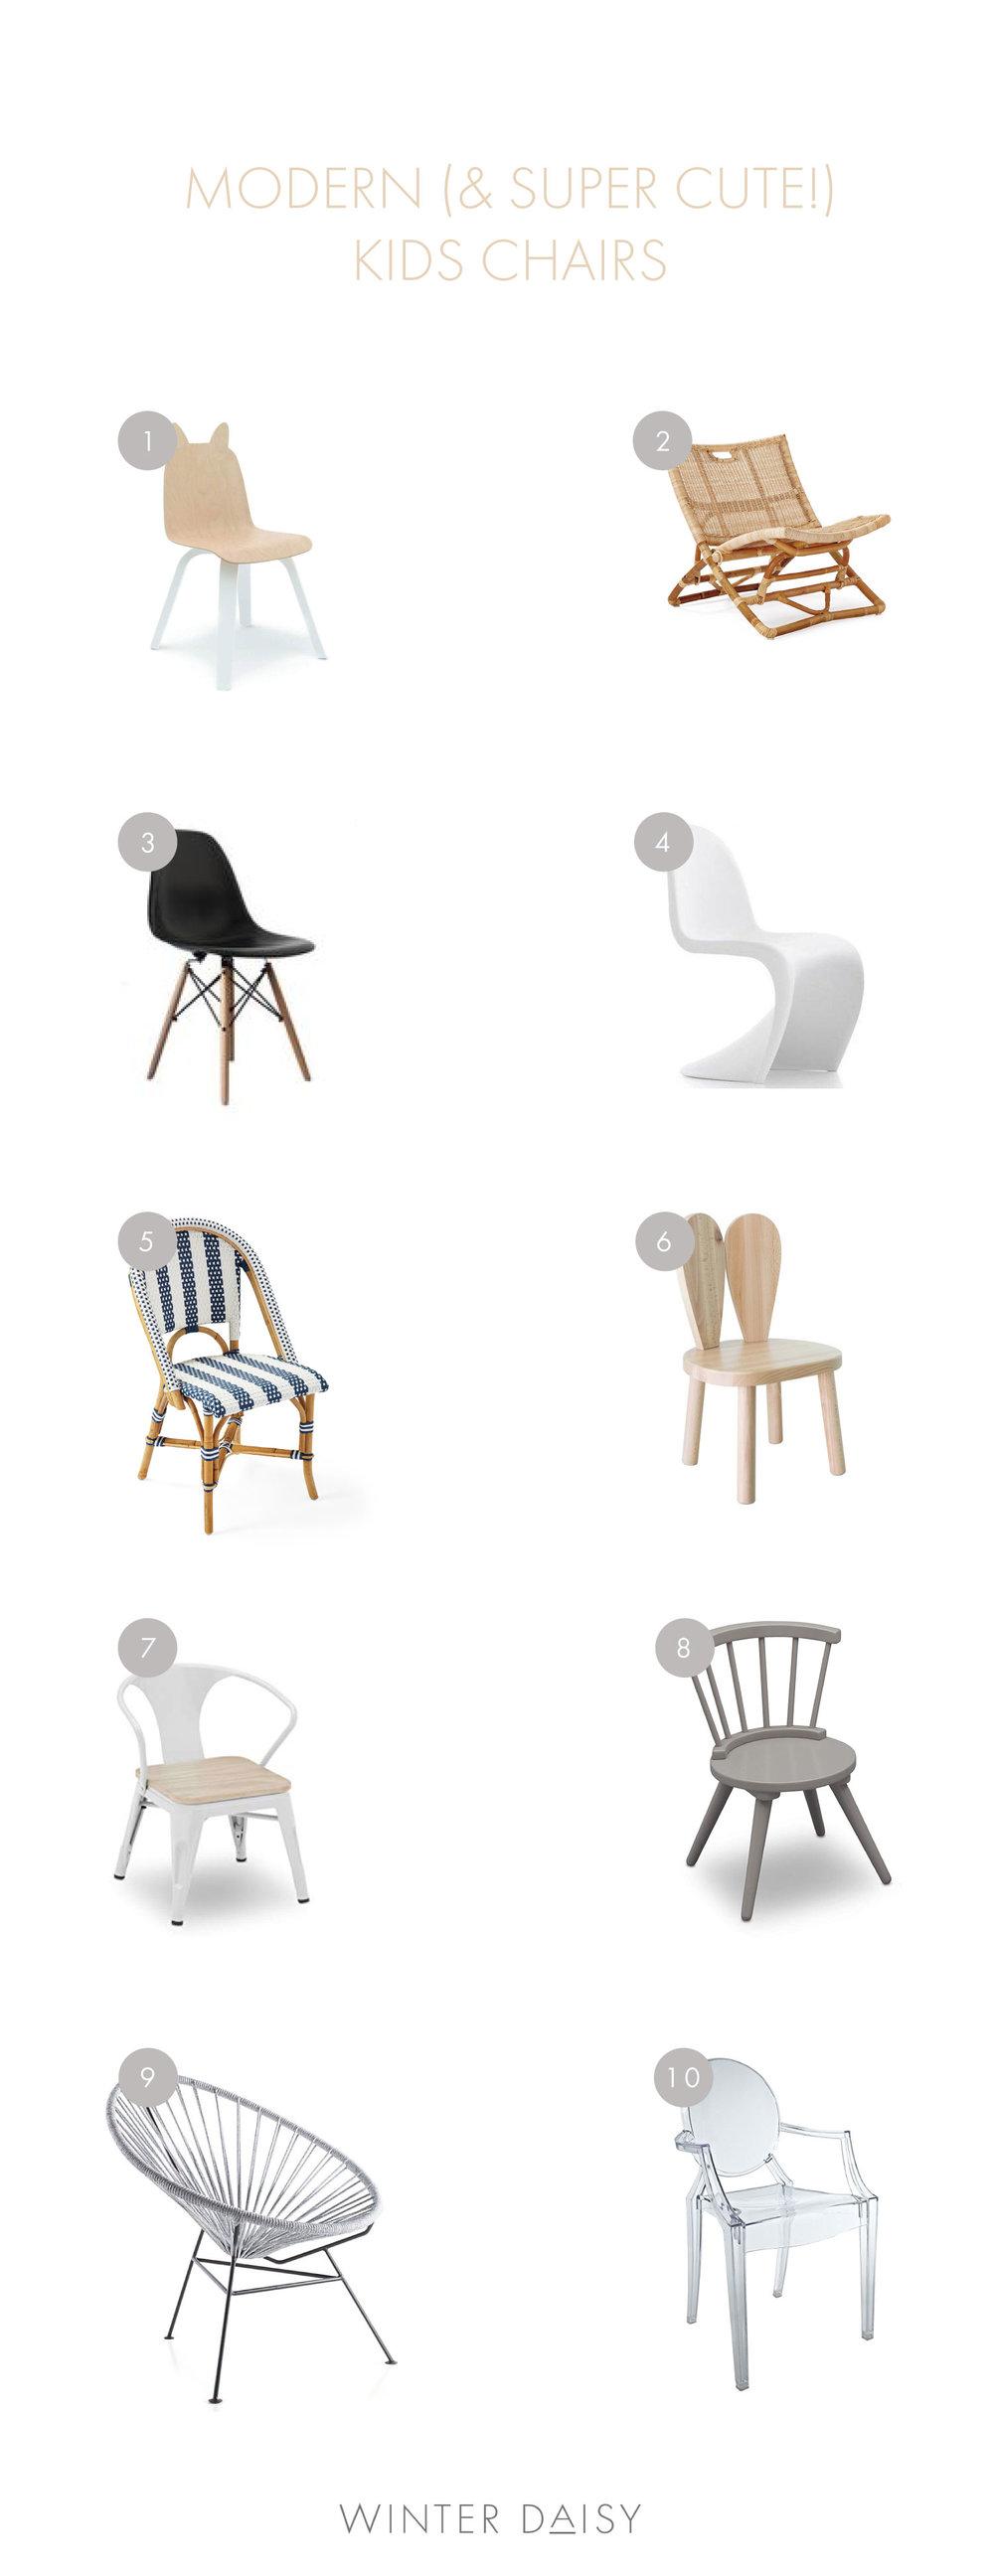 Modern (and super cute!) kids chairs